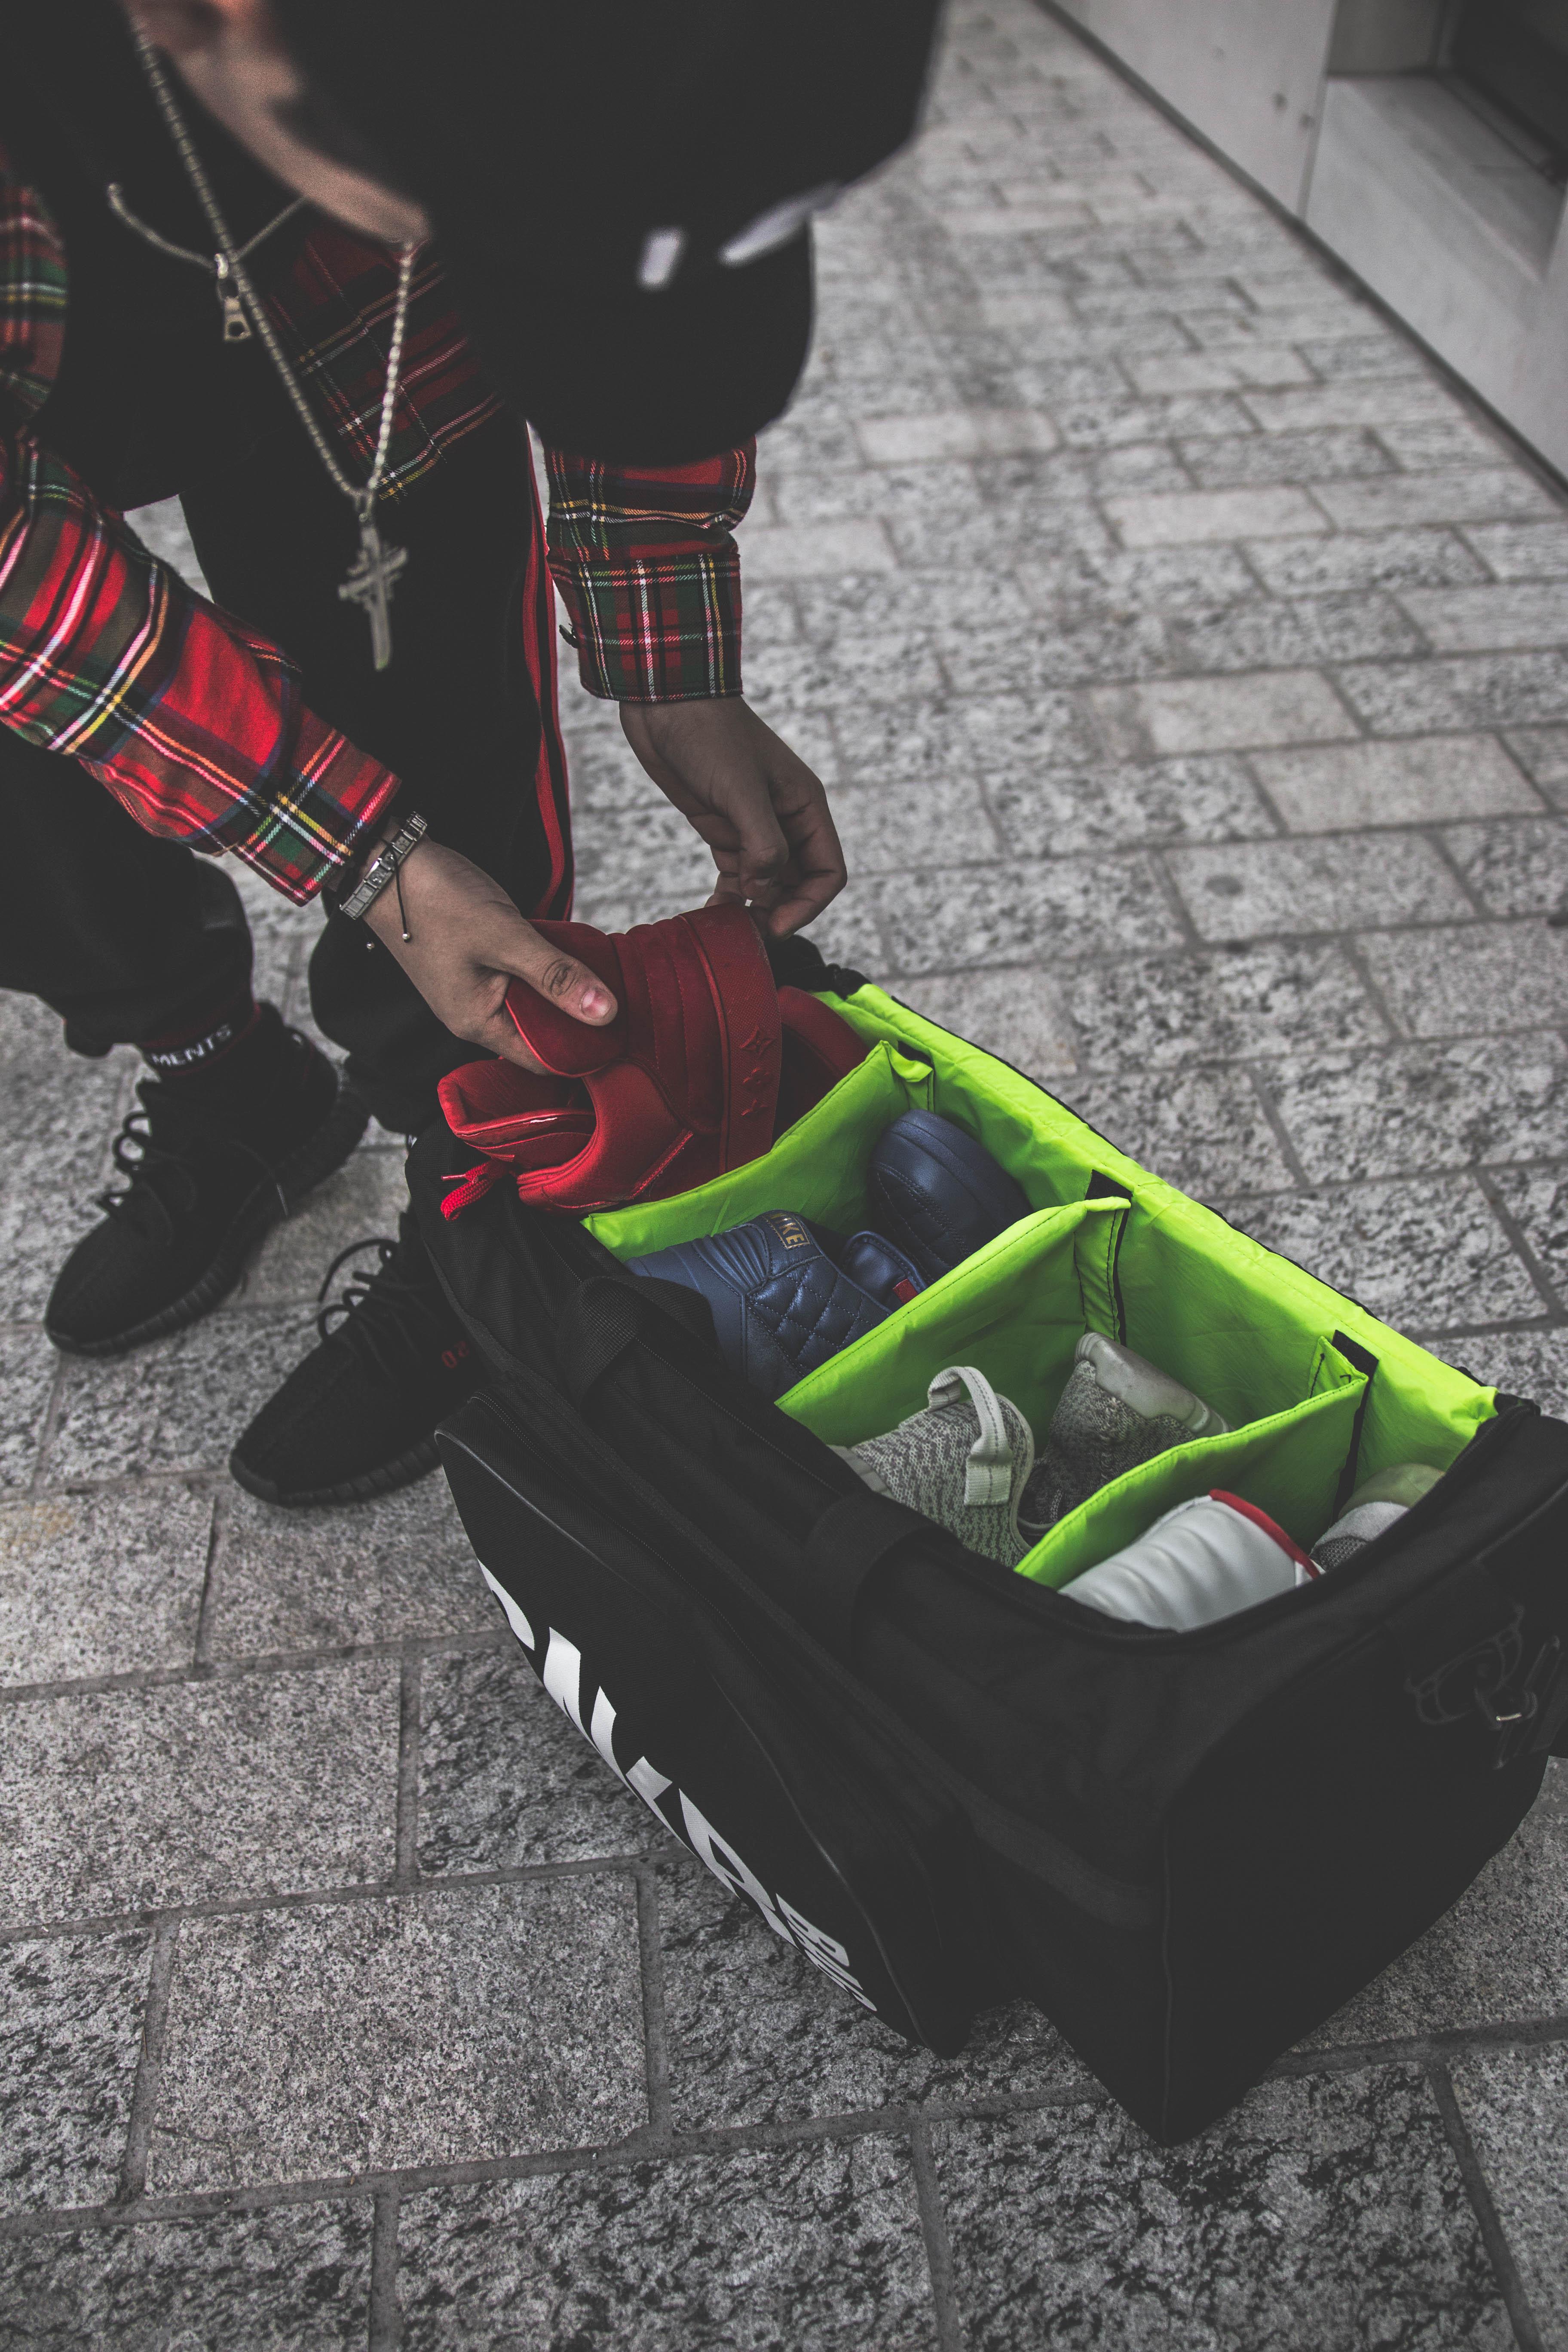 snkr bag by sneaker myth - release info